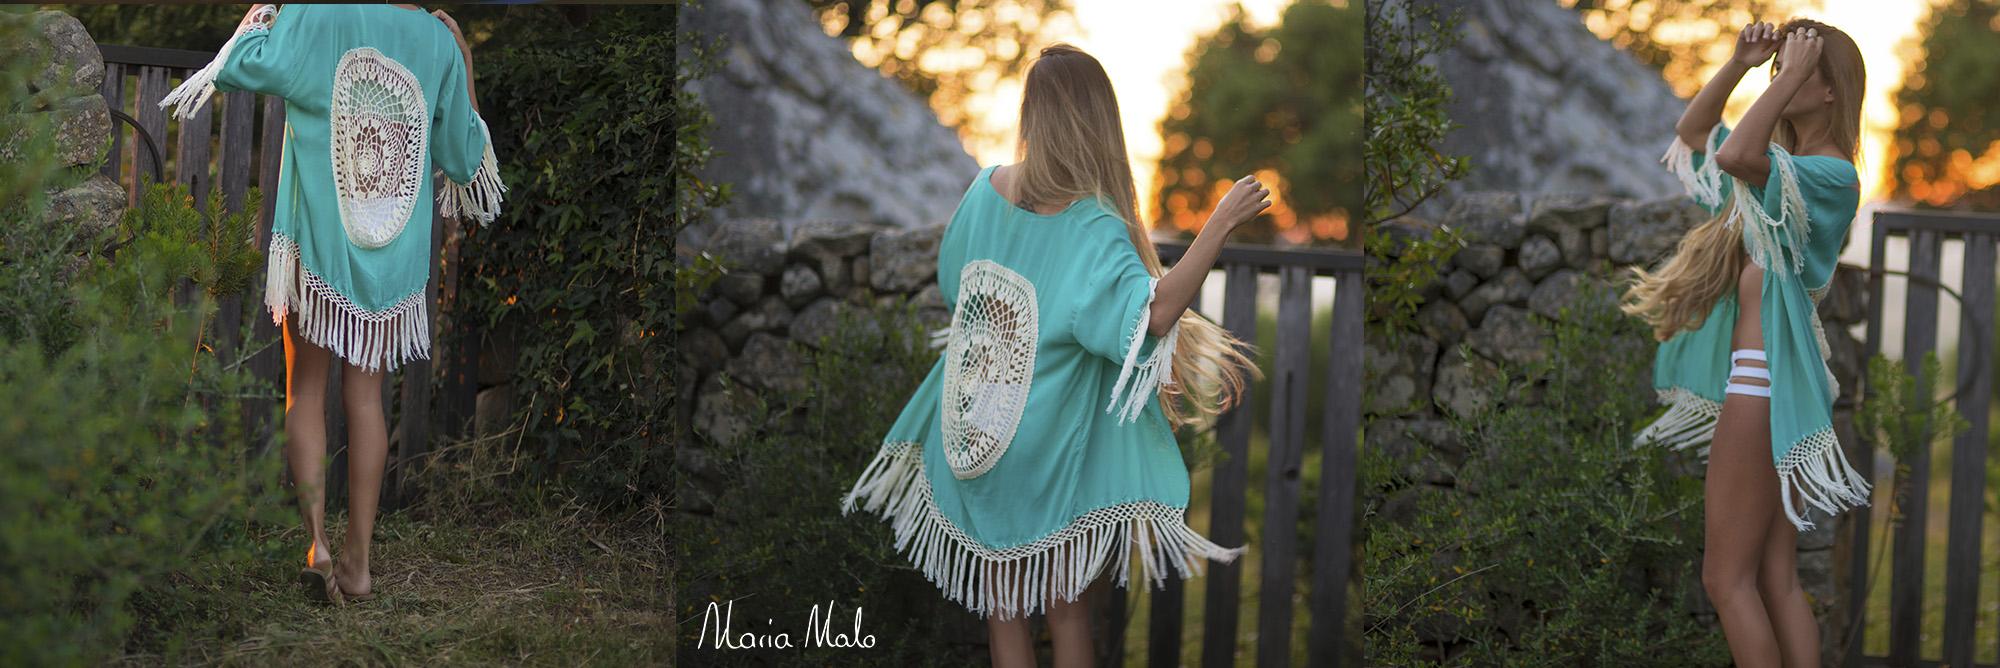 Maria Malo Summer Collection '16- The Caravan Tribe